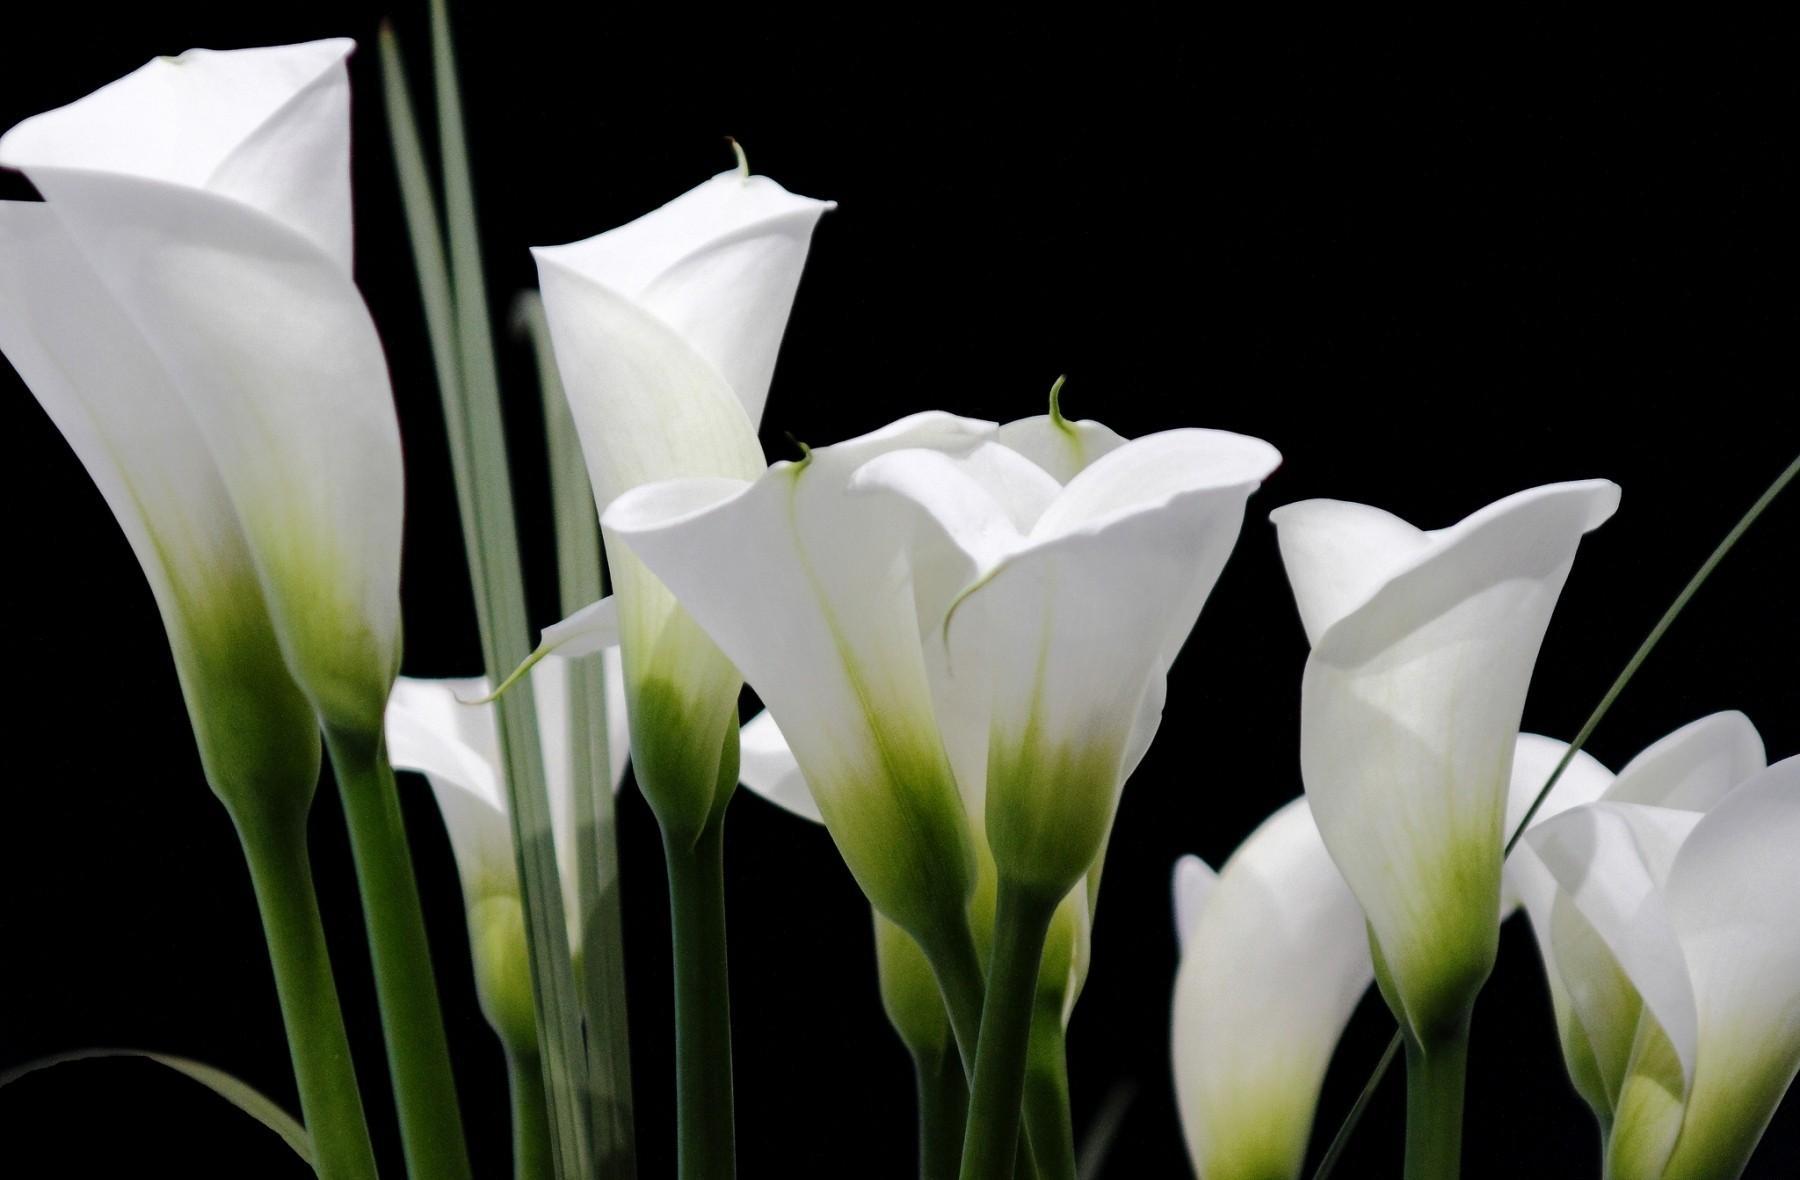 calla_lilies_white_black_background_62230_1800x1180